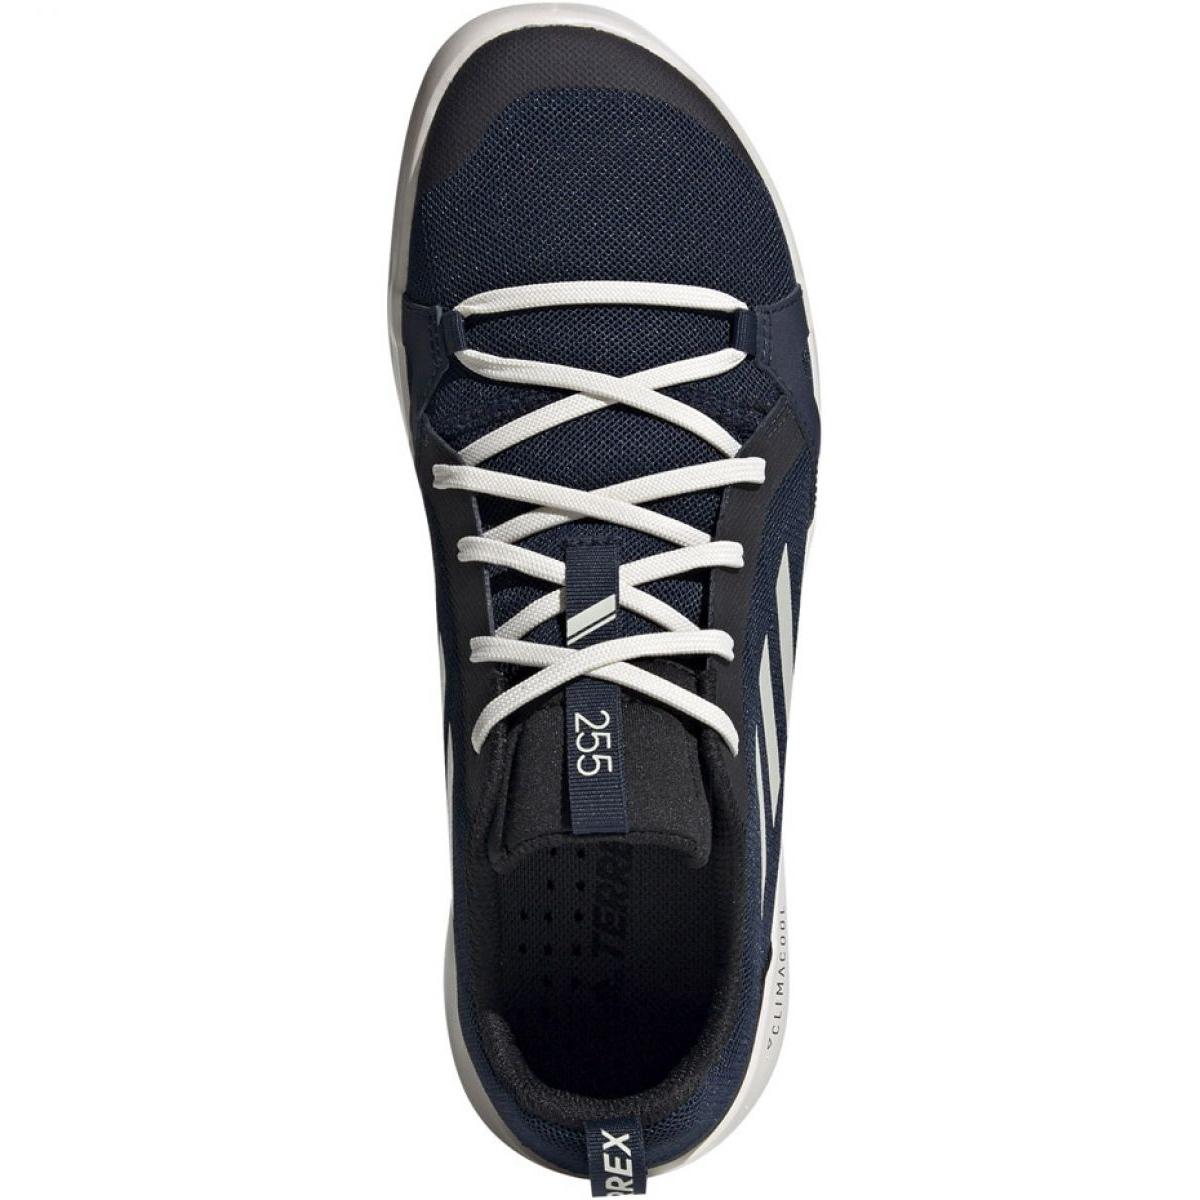 online store 3003d 4602a Navy Adidas Terrex Cc Boat M BC0507 shoes